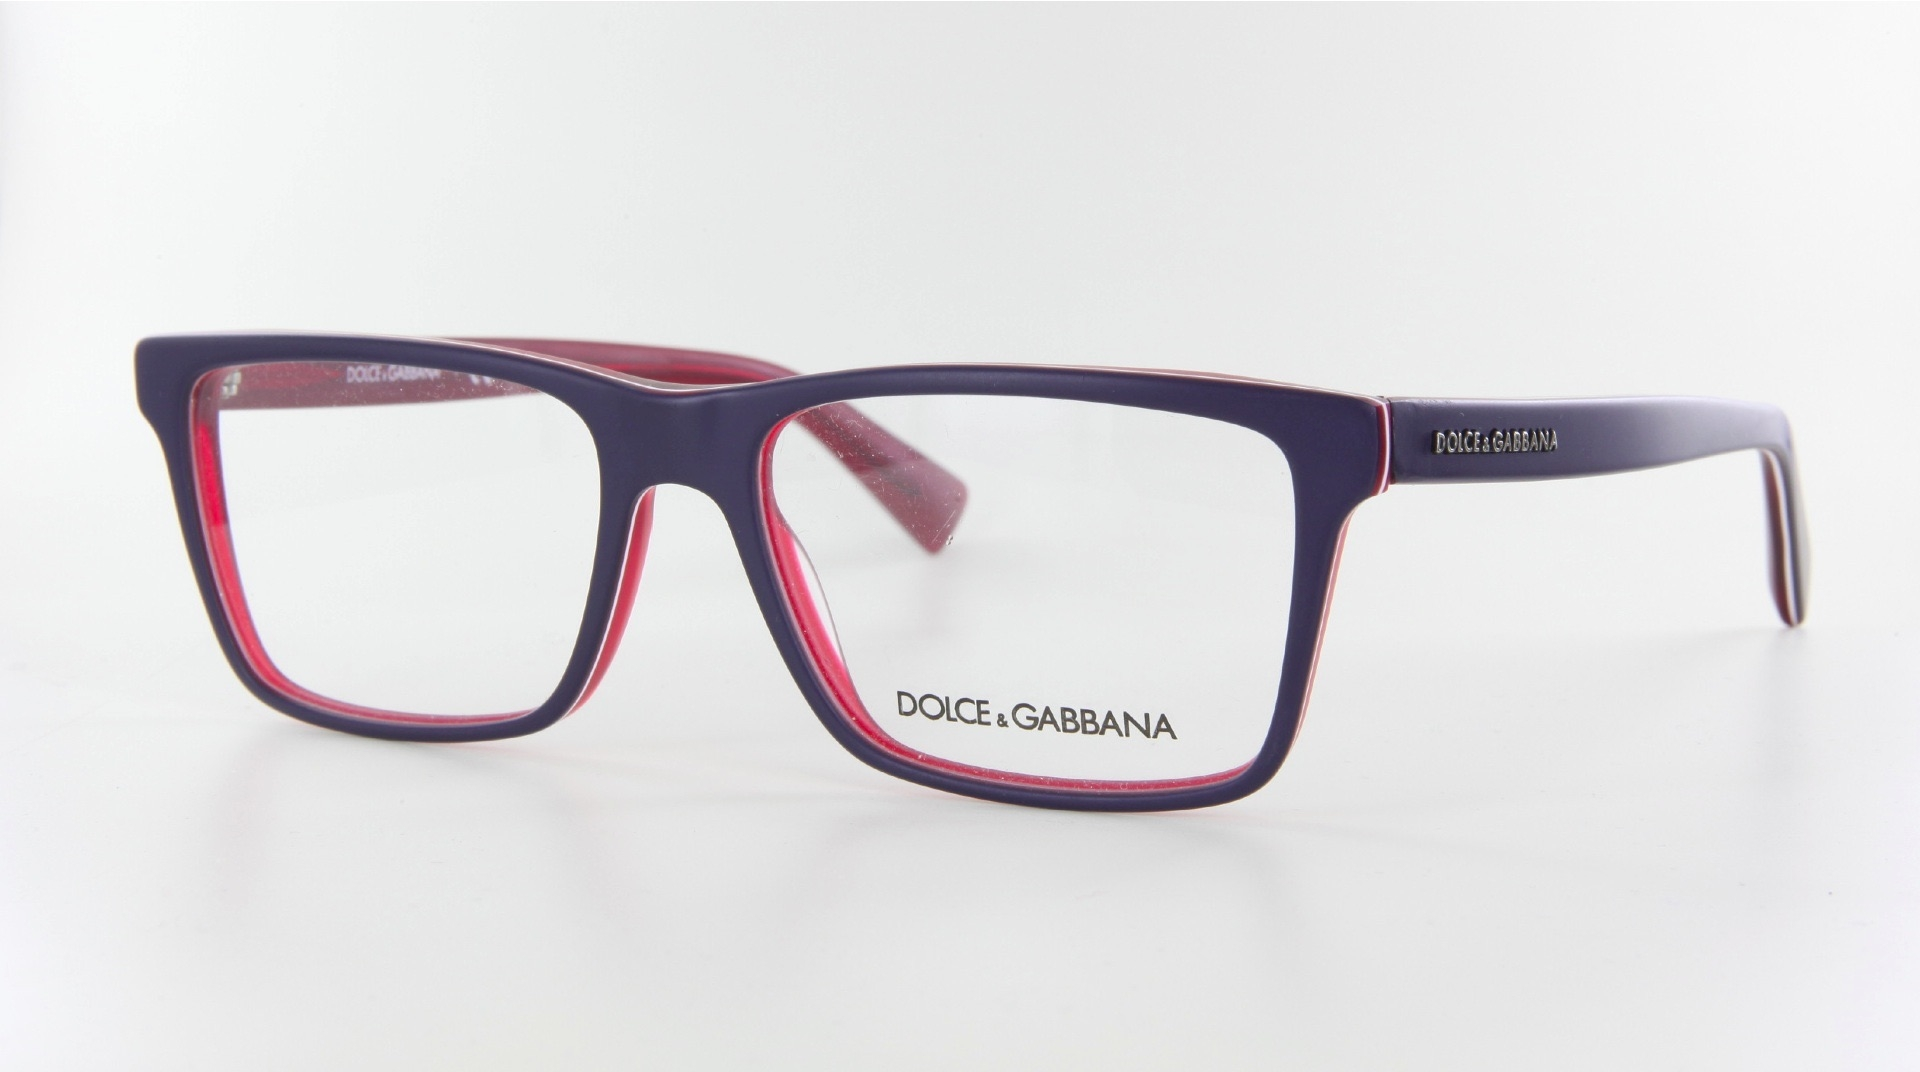 Dolce & Gabbana - ref: 71990